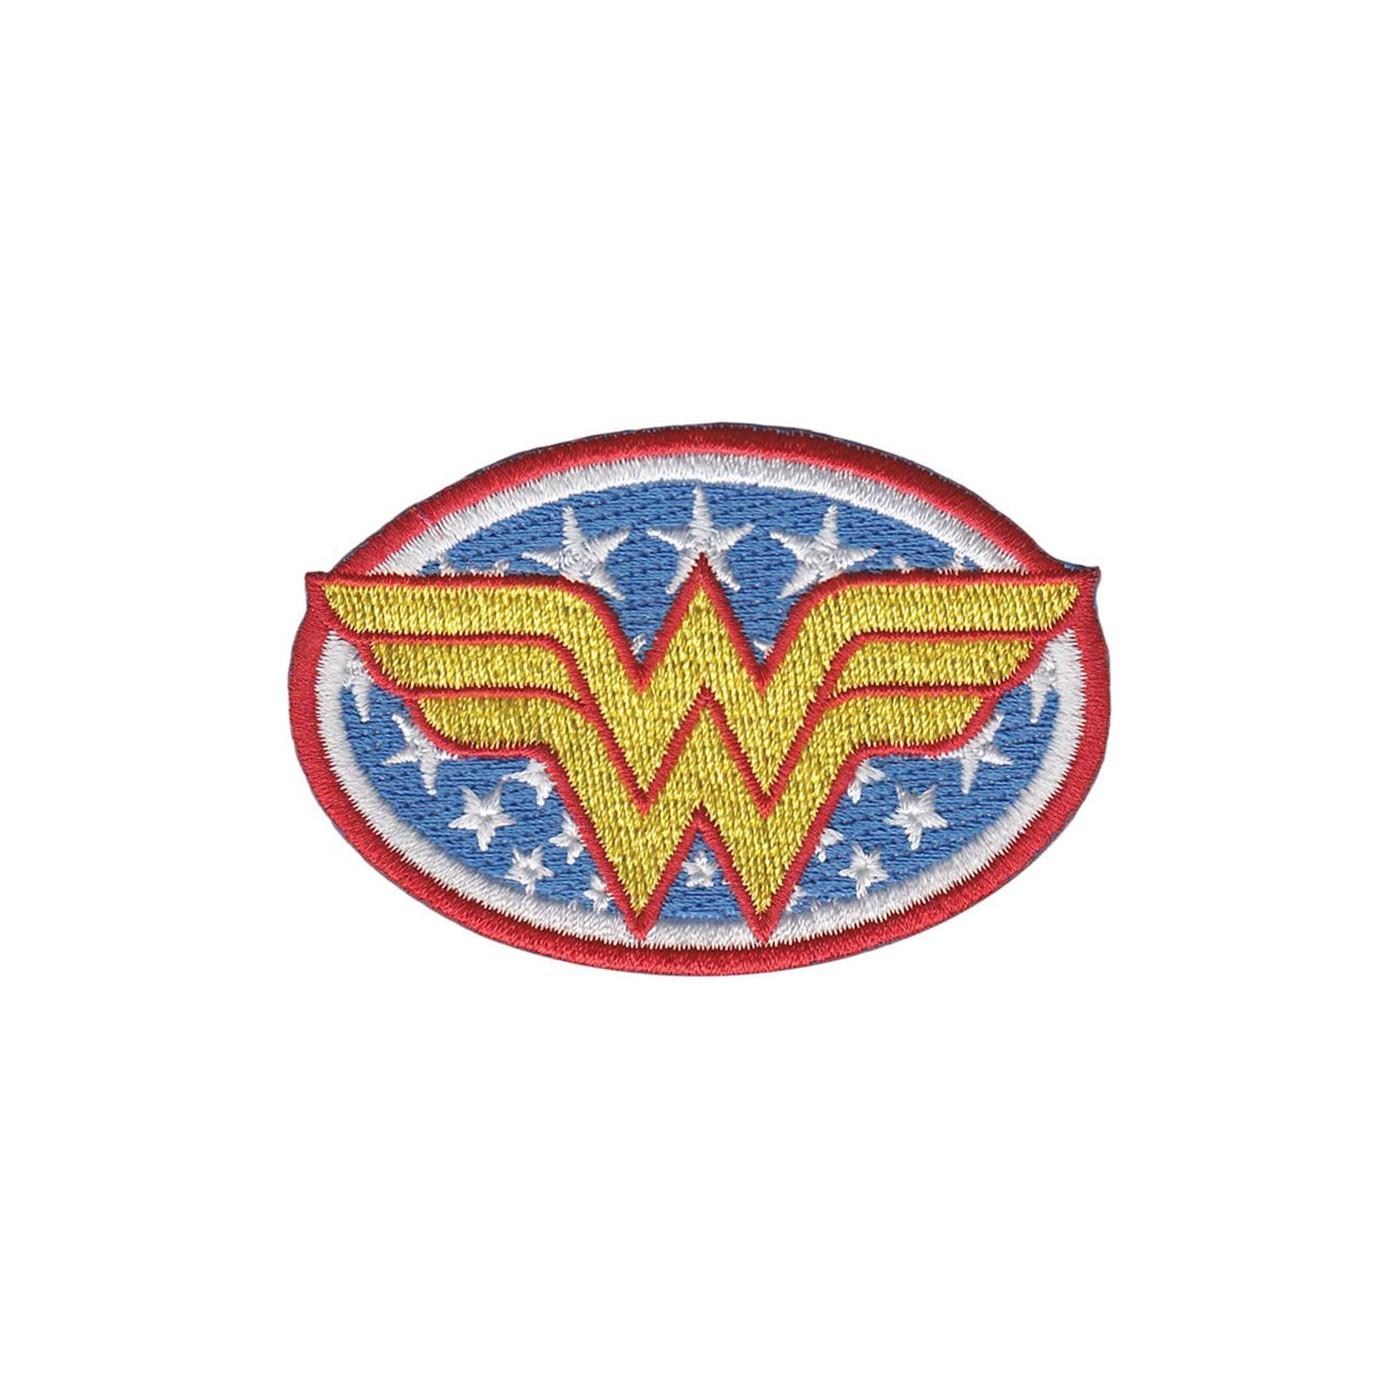 Wonder Woman Emblem Tumbler With Travel Lid 16 oz Tervis® Tumbler